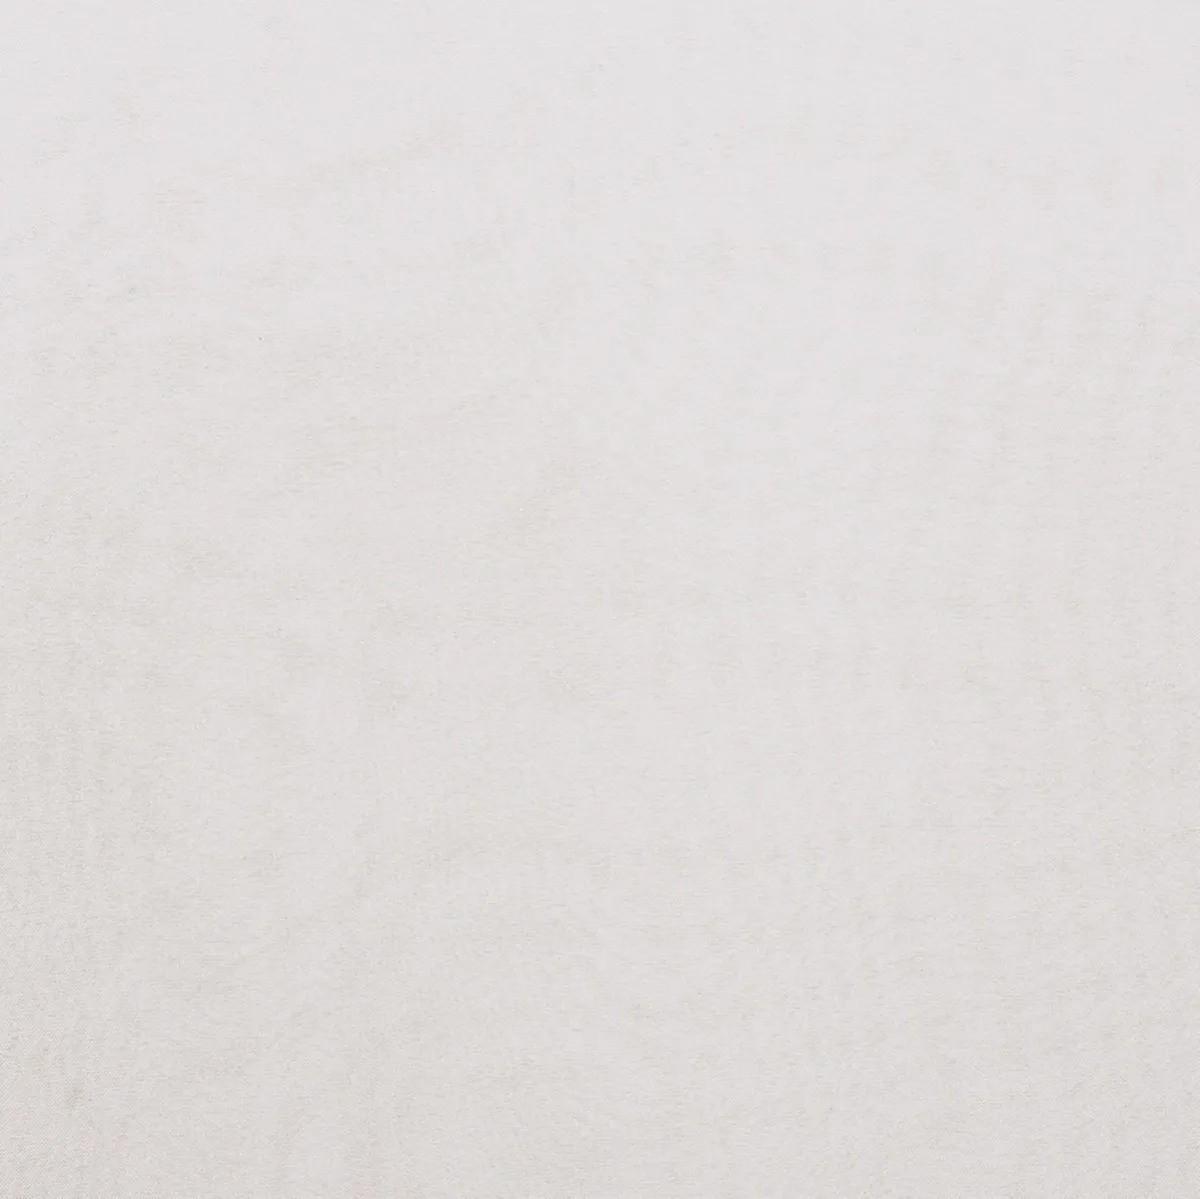 Cortina Blackout 100% Comfort Off White 5,40 x 2,50 Bella Janela